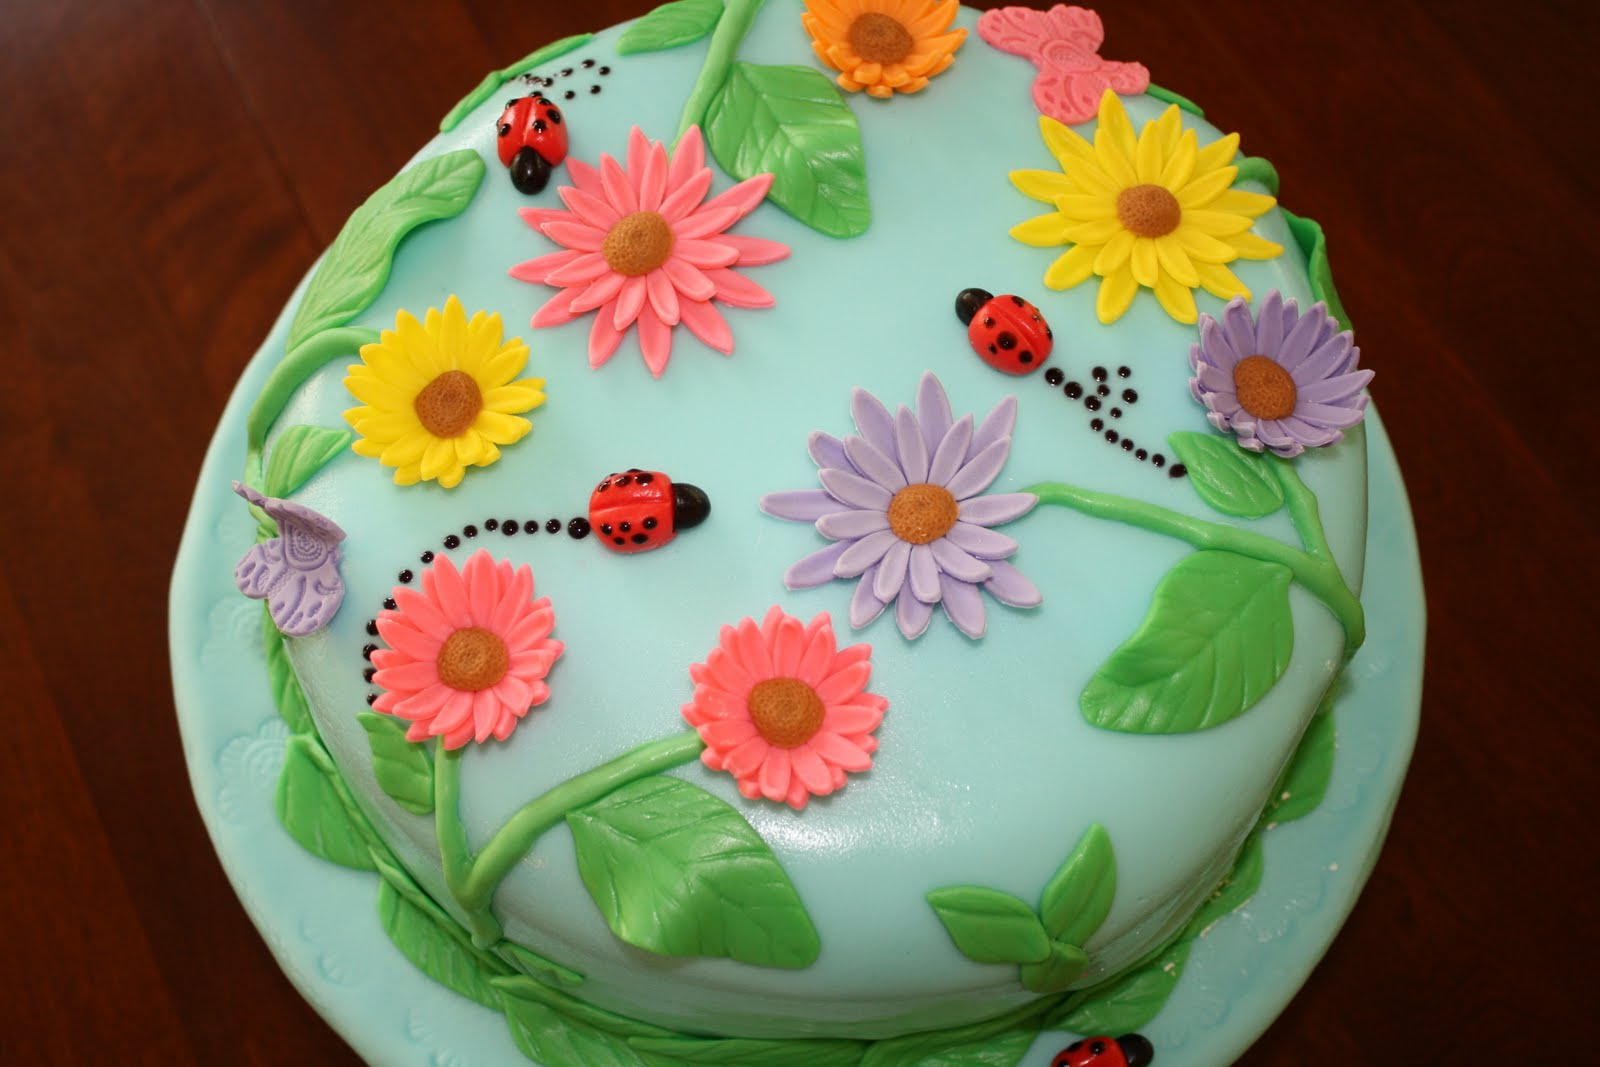 Fondant Cake Design For Husband : CC s Cake Decorating: Mine & my husbands birthday cake!!